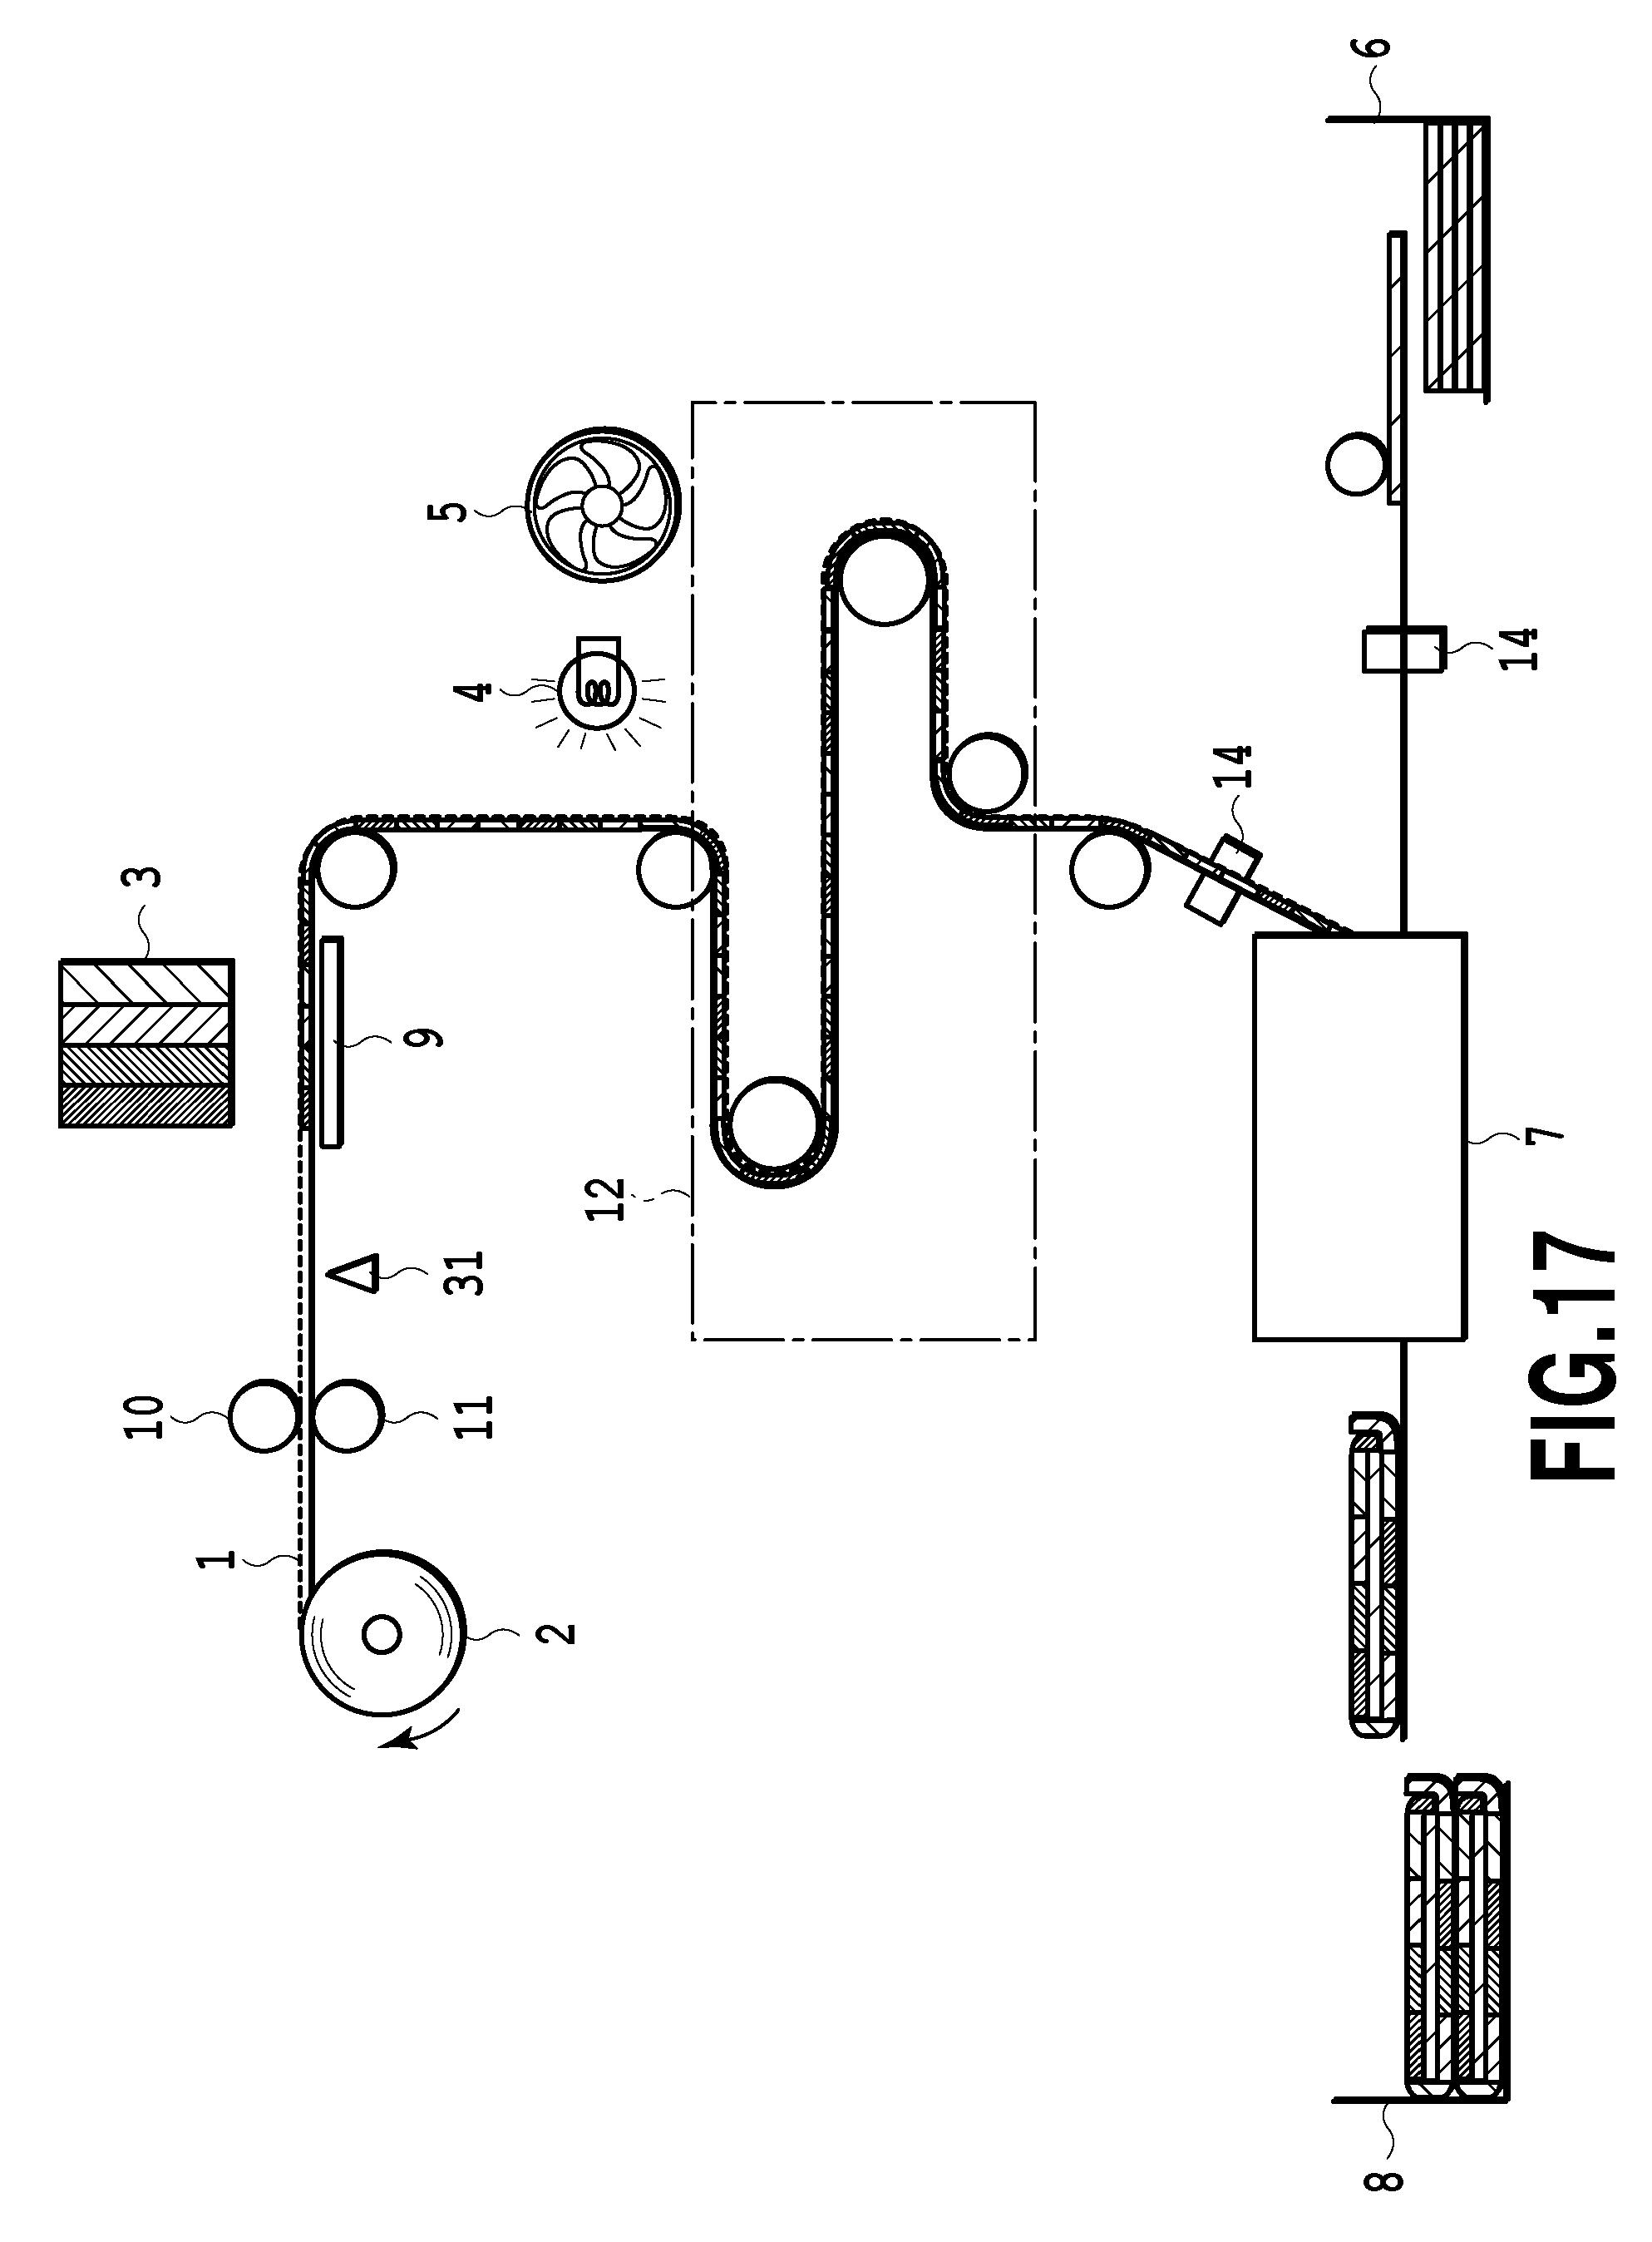 Bar 6 Cake Feeders Wiring Diagram